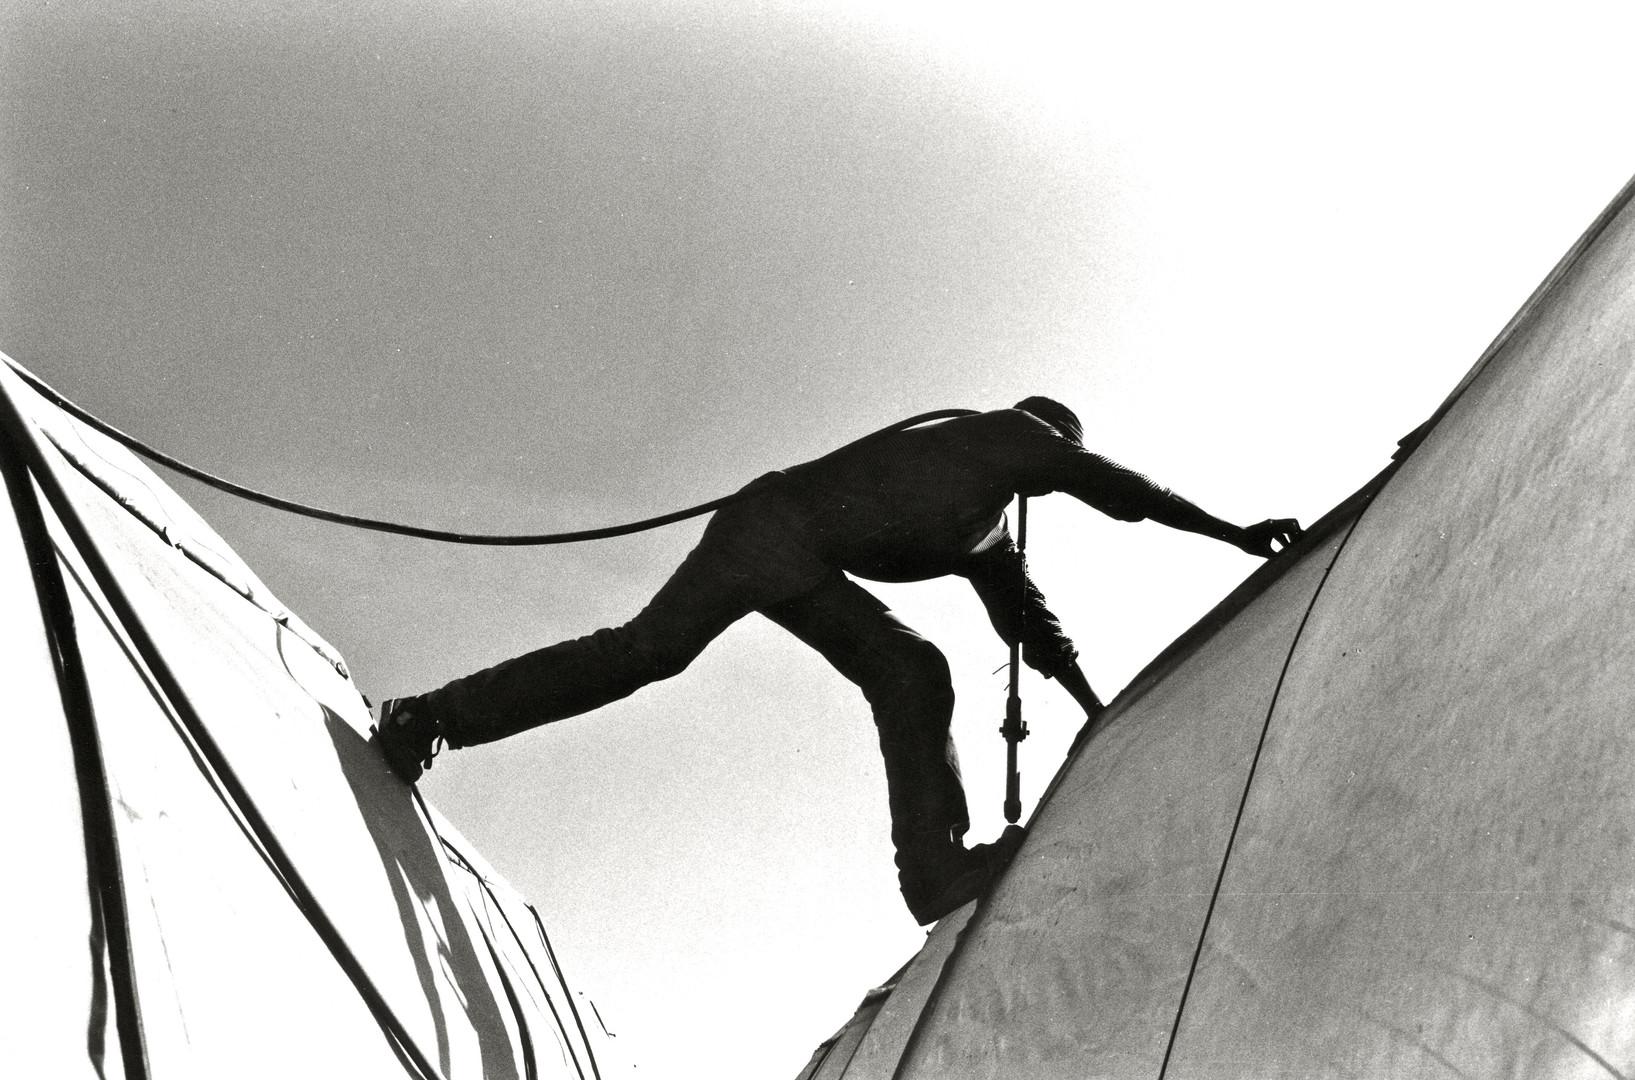 acrobaties rurales #2